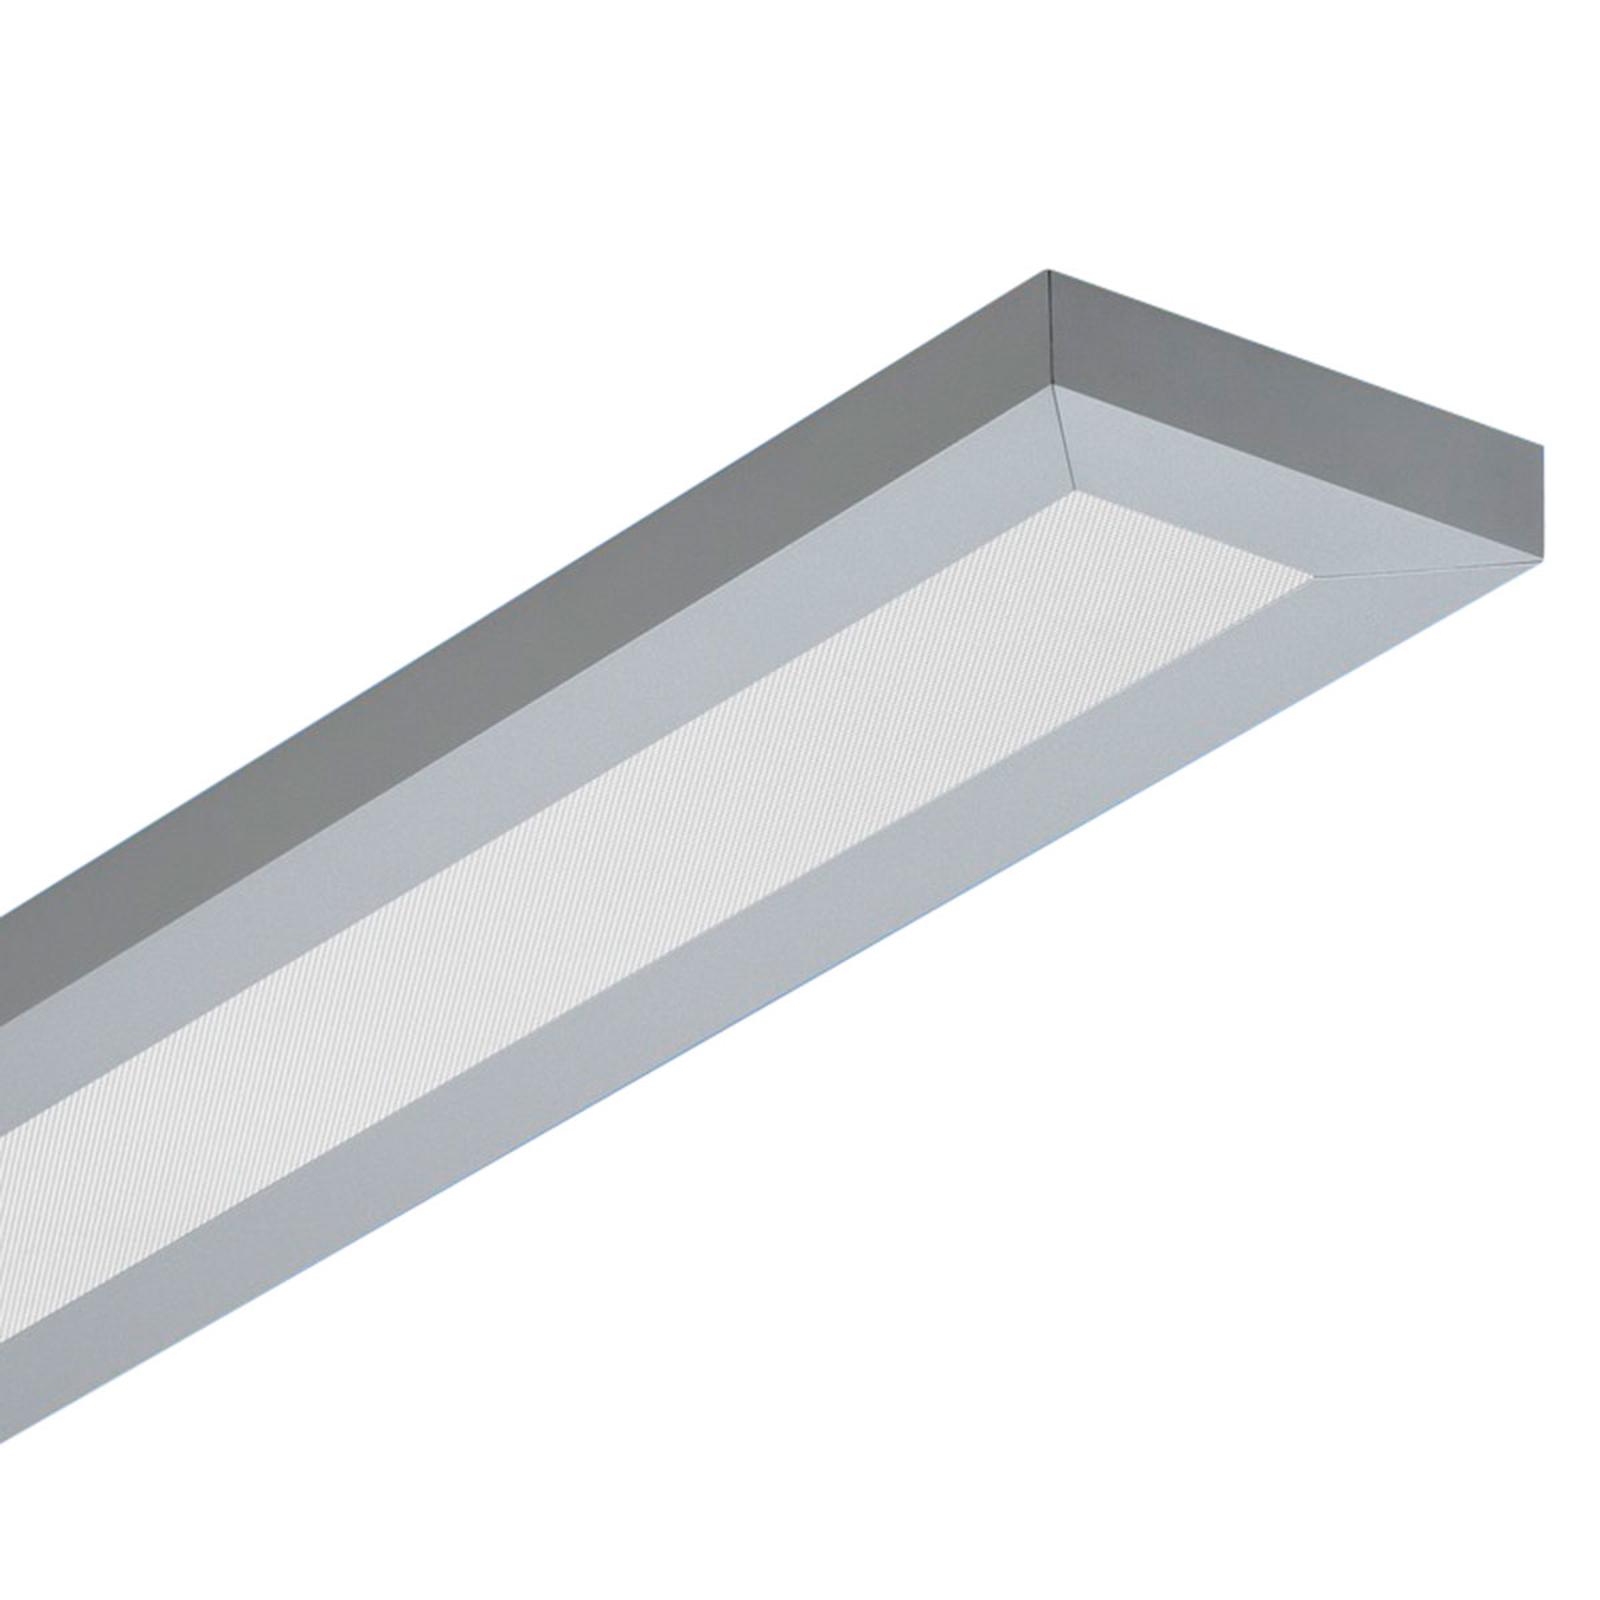 Langwerpige LED hanglamp LAP, 30,4 W, 4.000 K